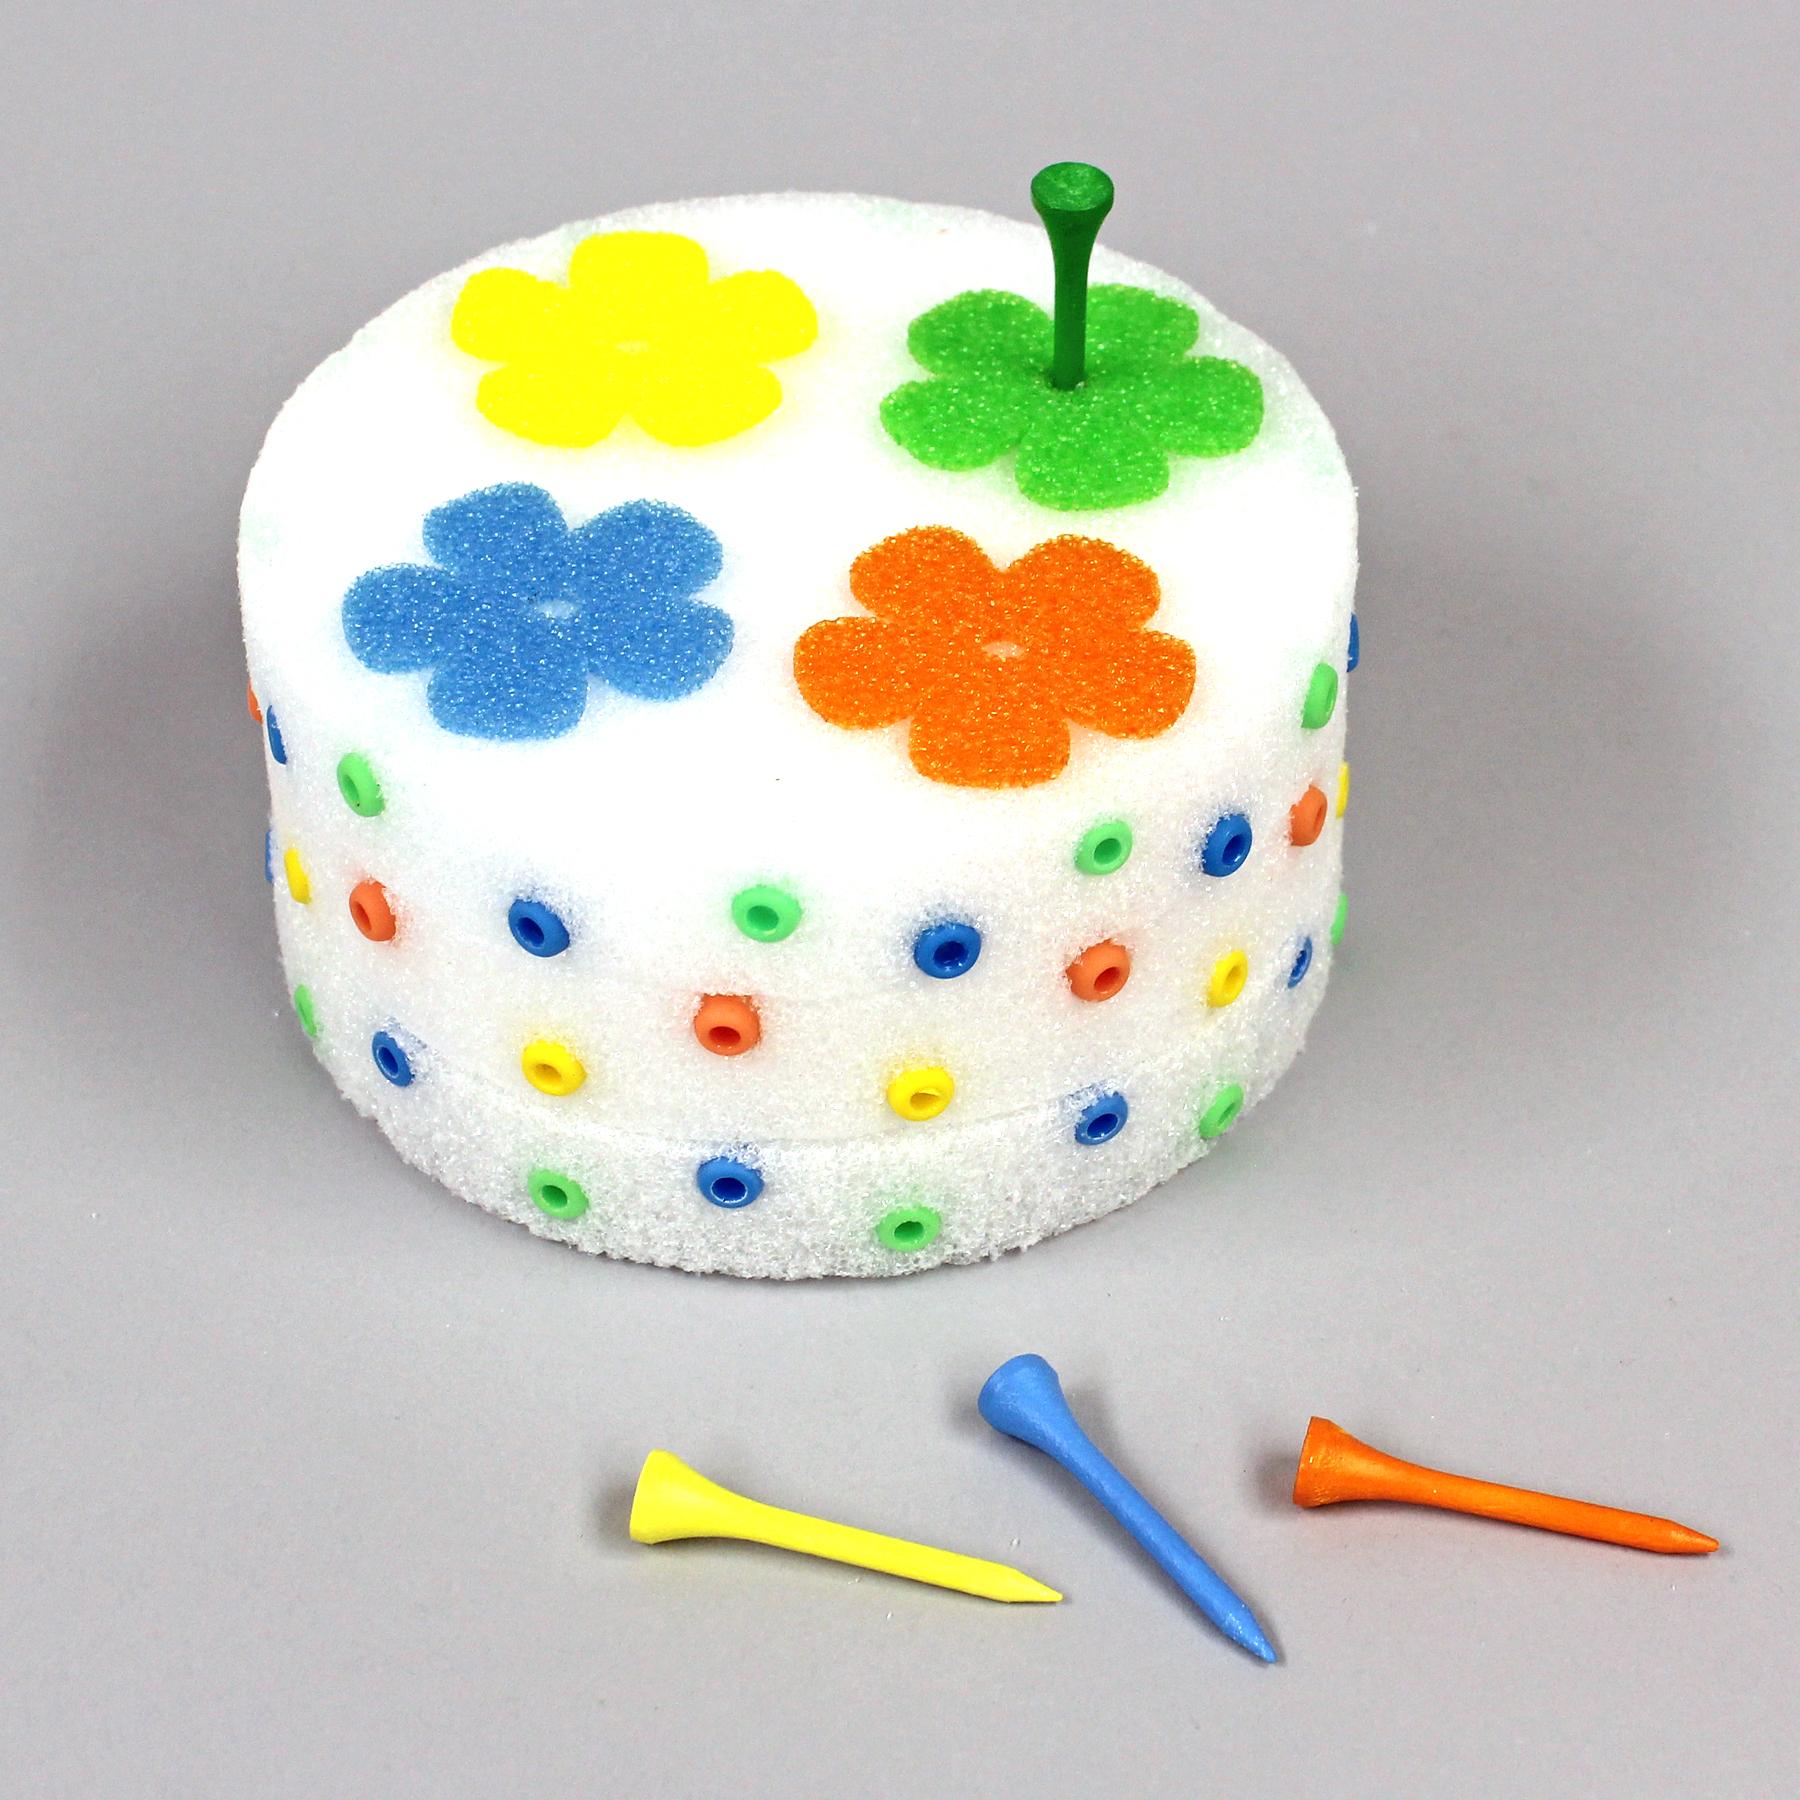 cakecolorgamestepg